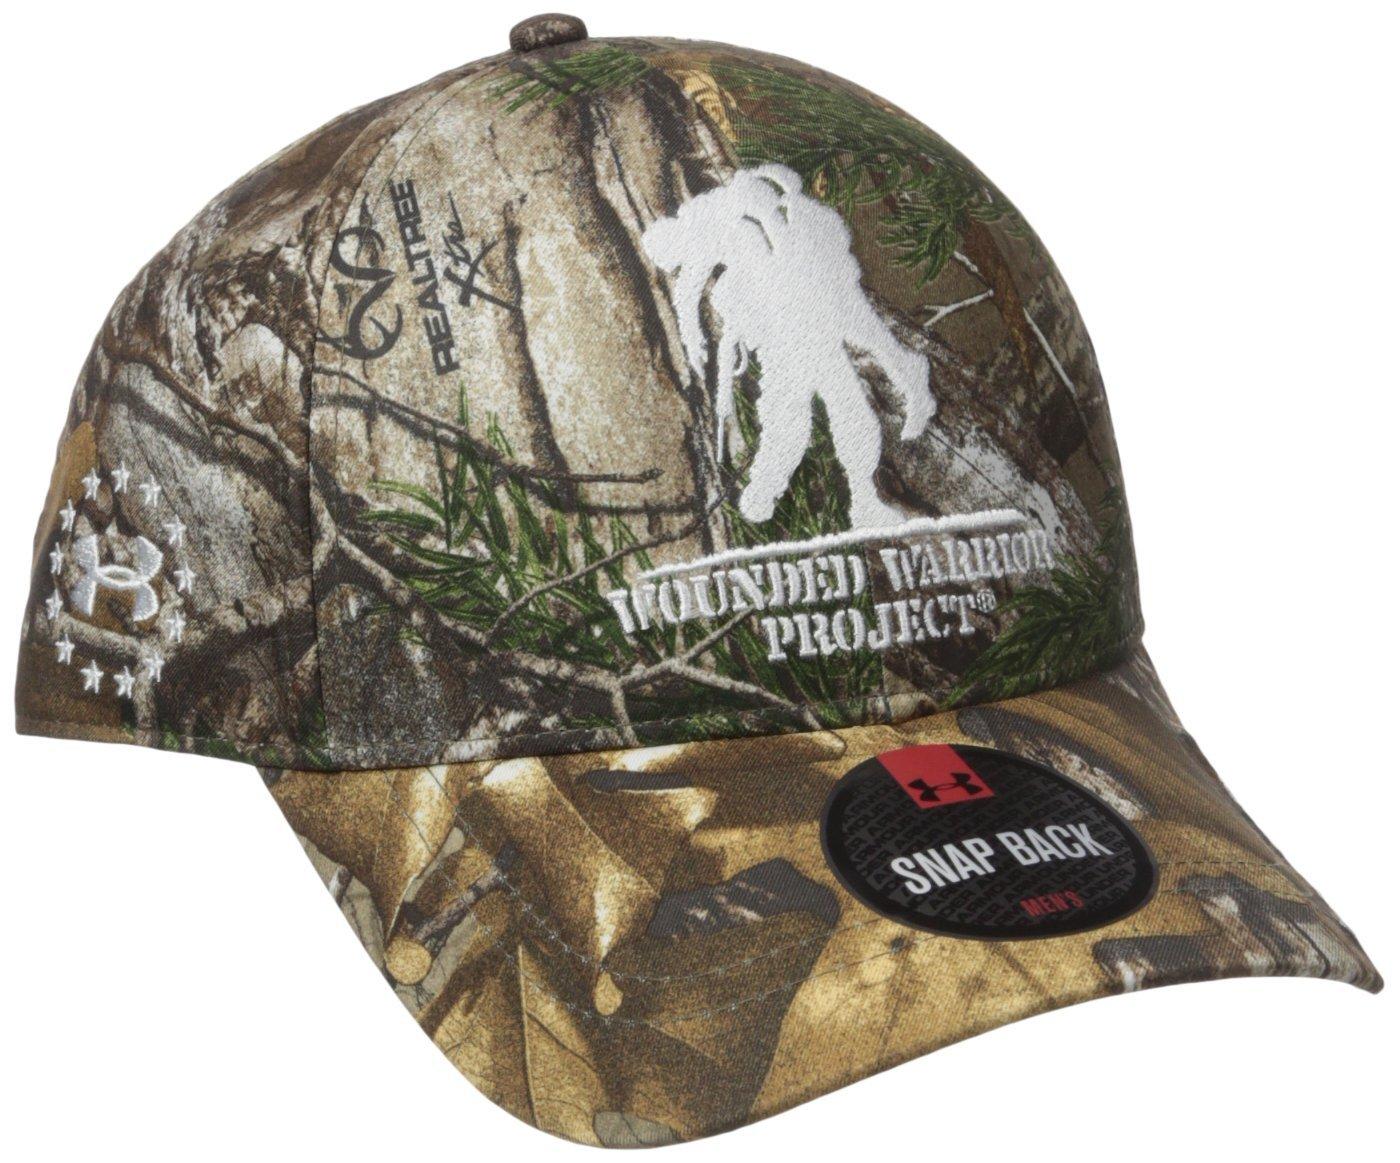 c41e75abb3e Amazon.com  Men s Under Armour Hunt Camo WWP Cap Hunting Headwear Mossy Oak  Treestand White Size One Size  Camera   Photo